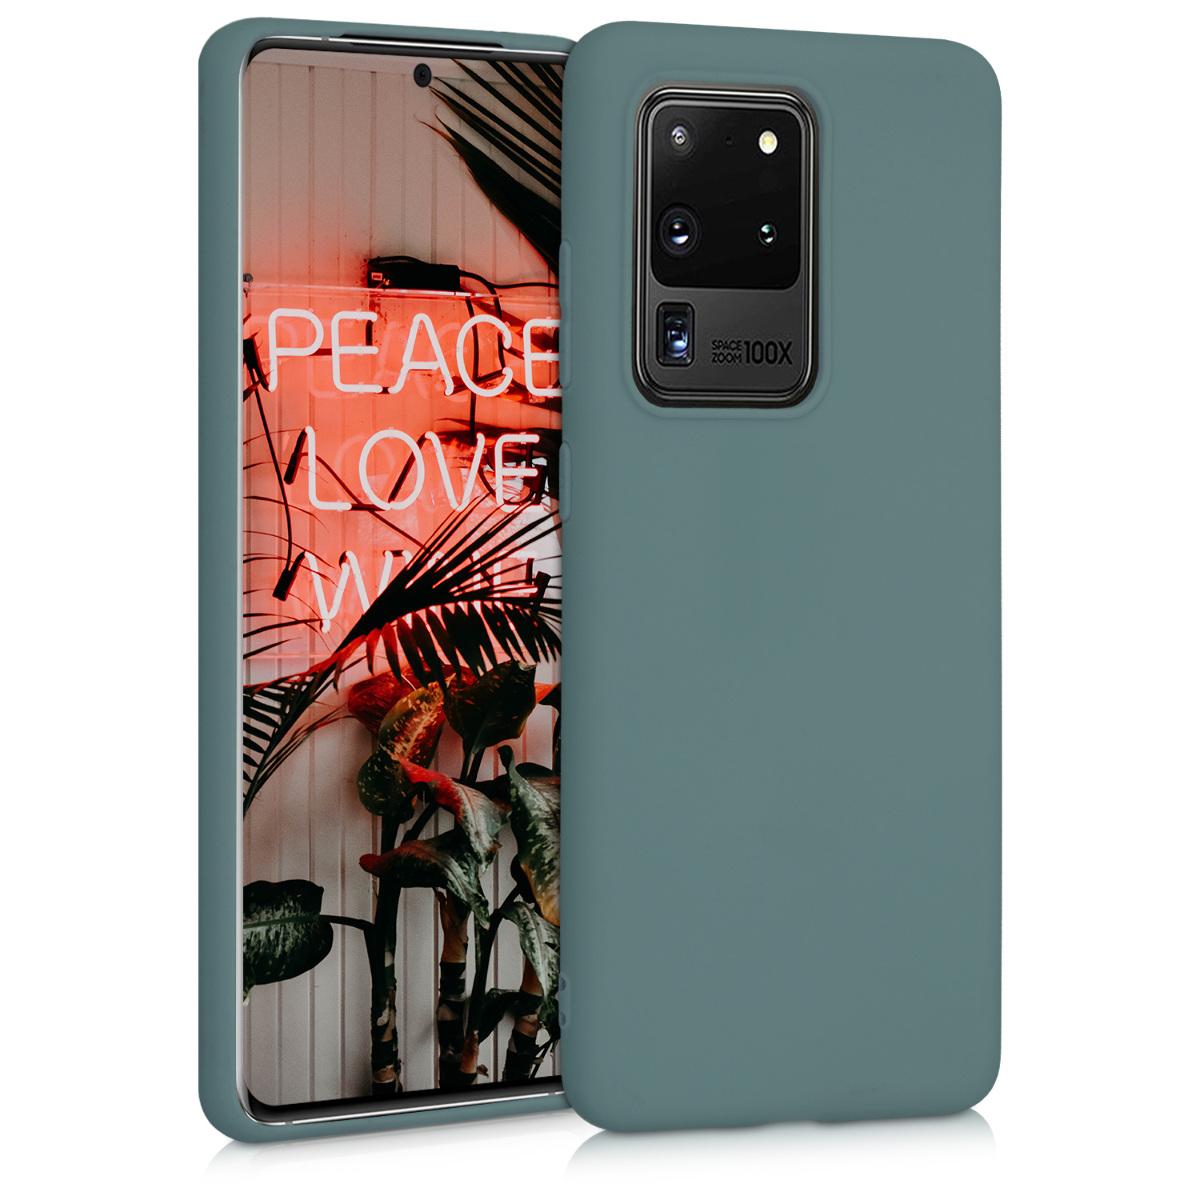 KW Θήκη Σιλικόνης Samsung Galaxy S20 Ultra - Blue Green (51225.171)